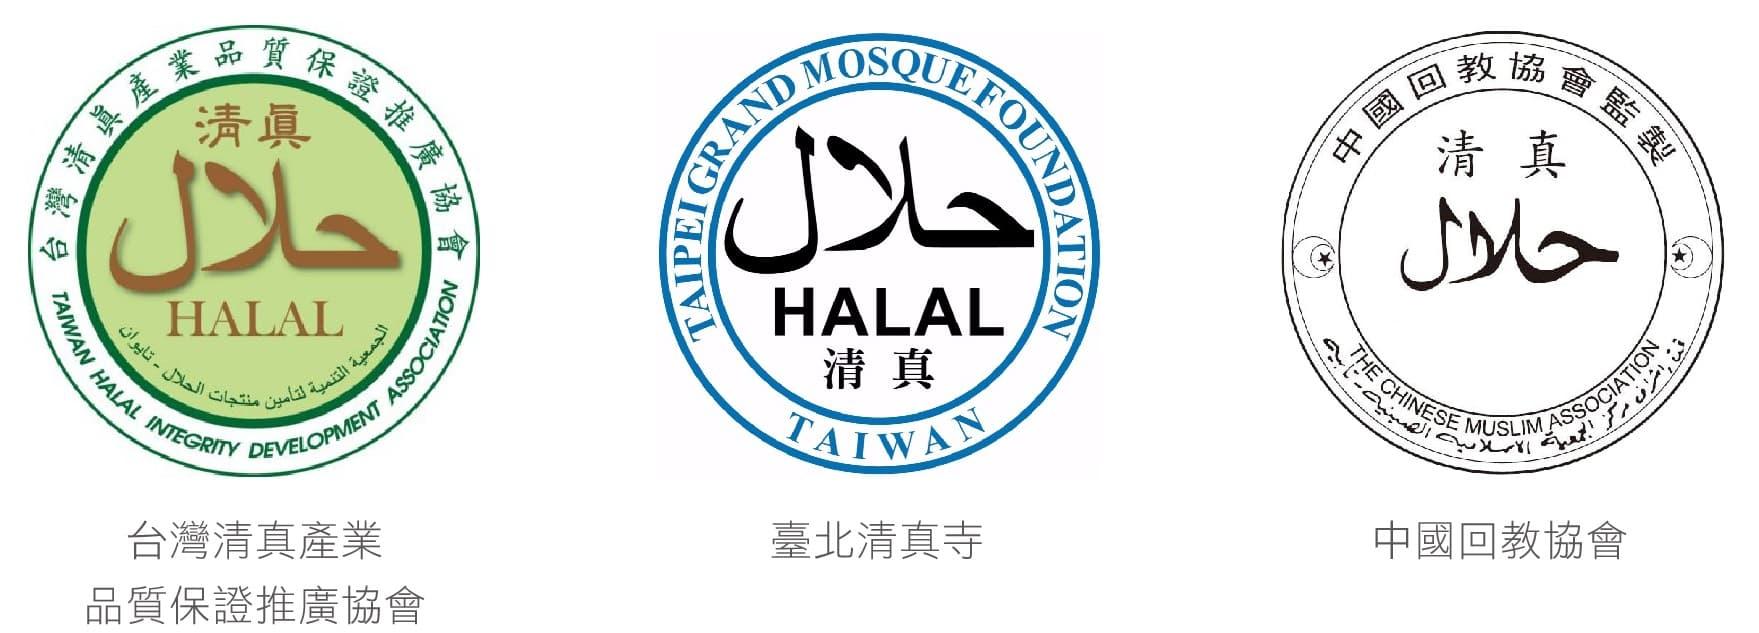 HALAL認證單位與標誌